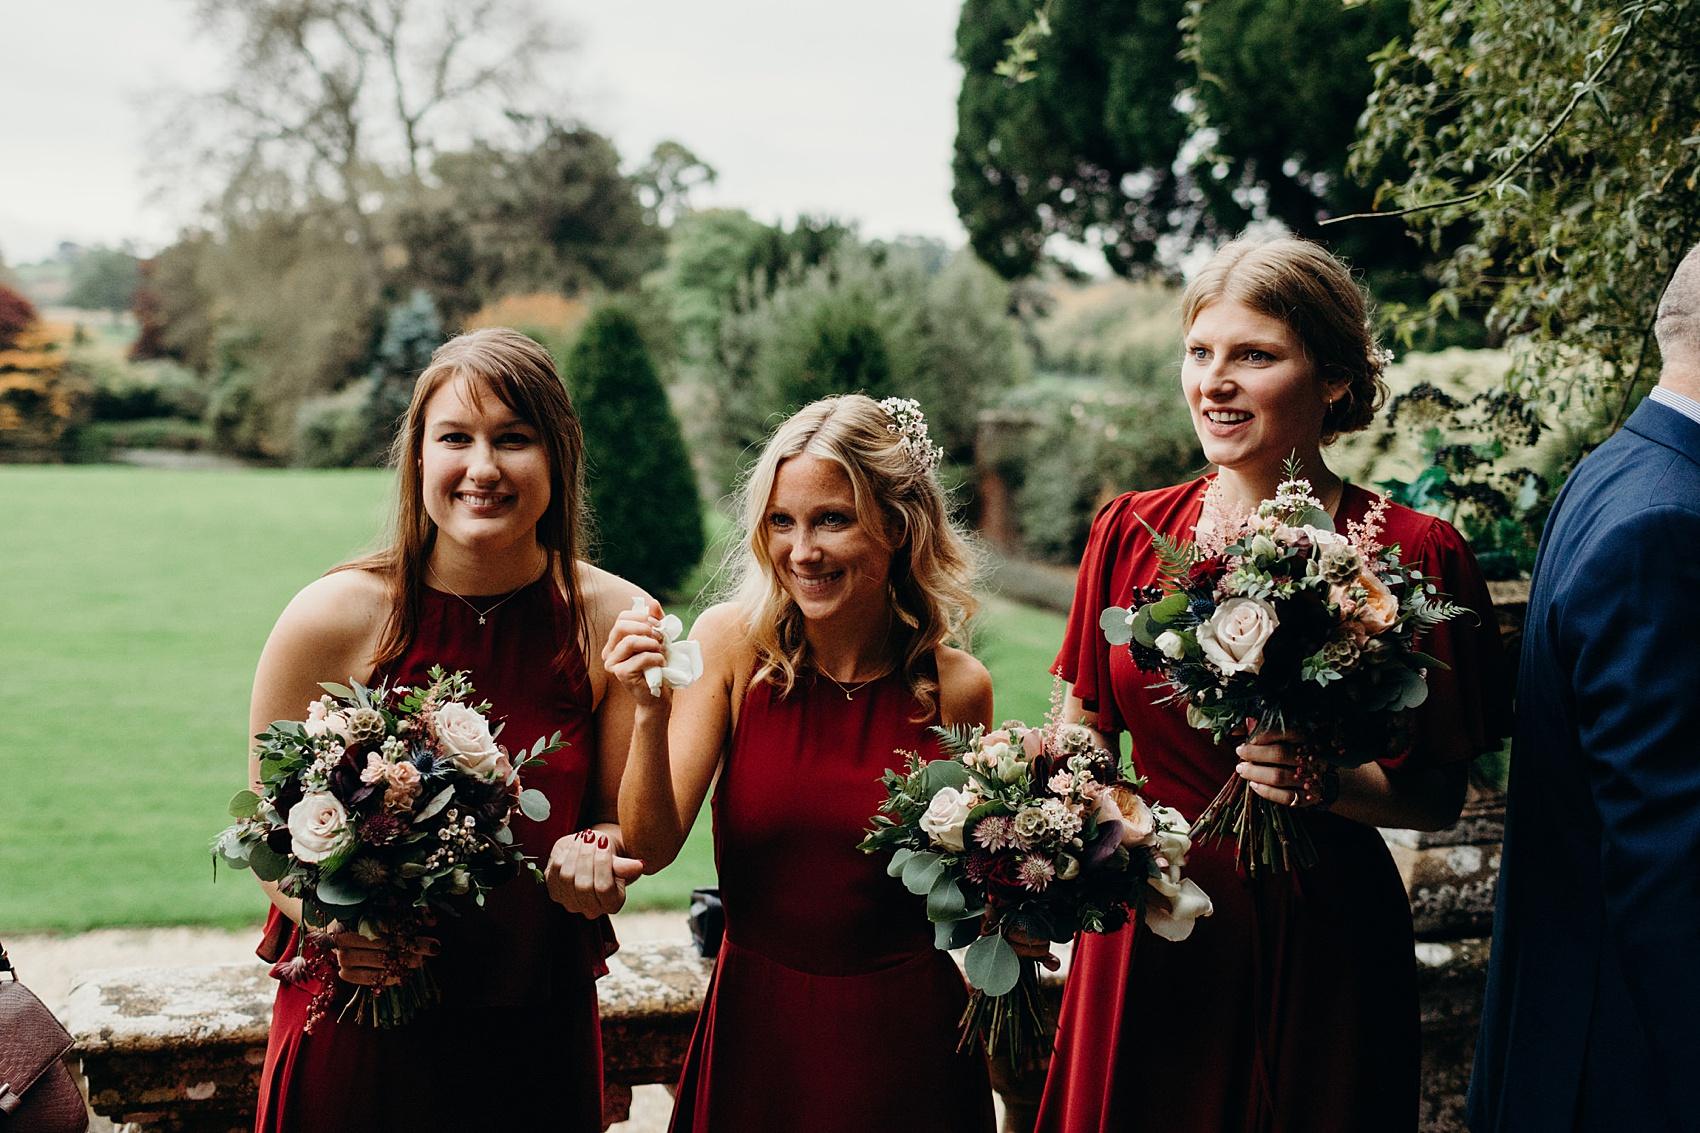 Temperley London bride Brympton House Somerset wedding  - A Temperley London Bride and her October Wedding at Brympton House in Somerset